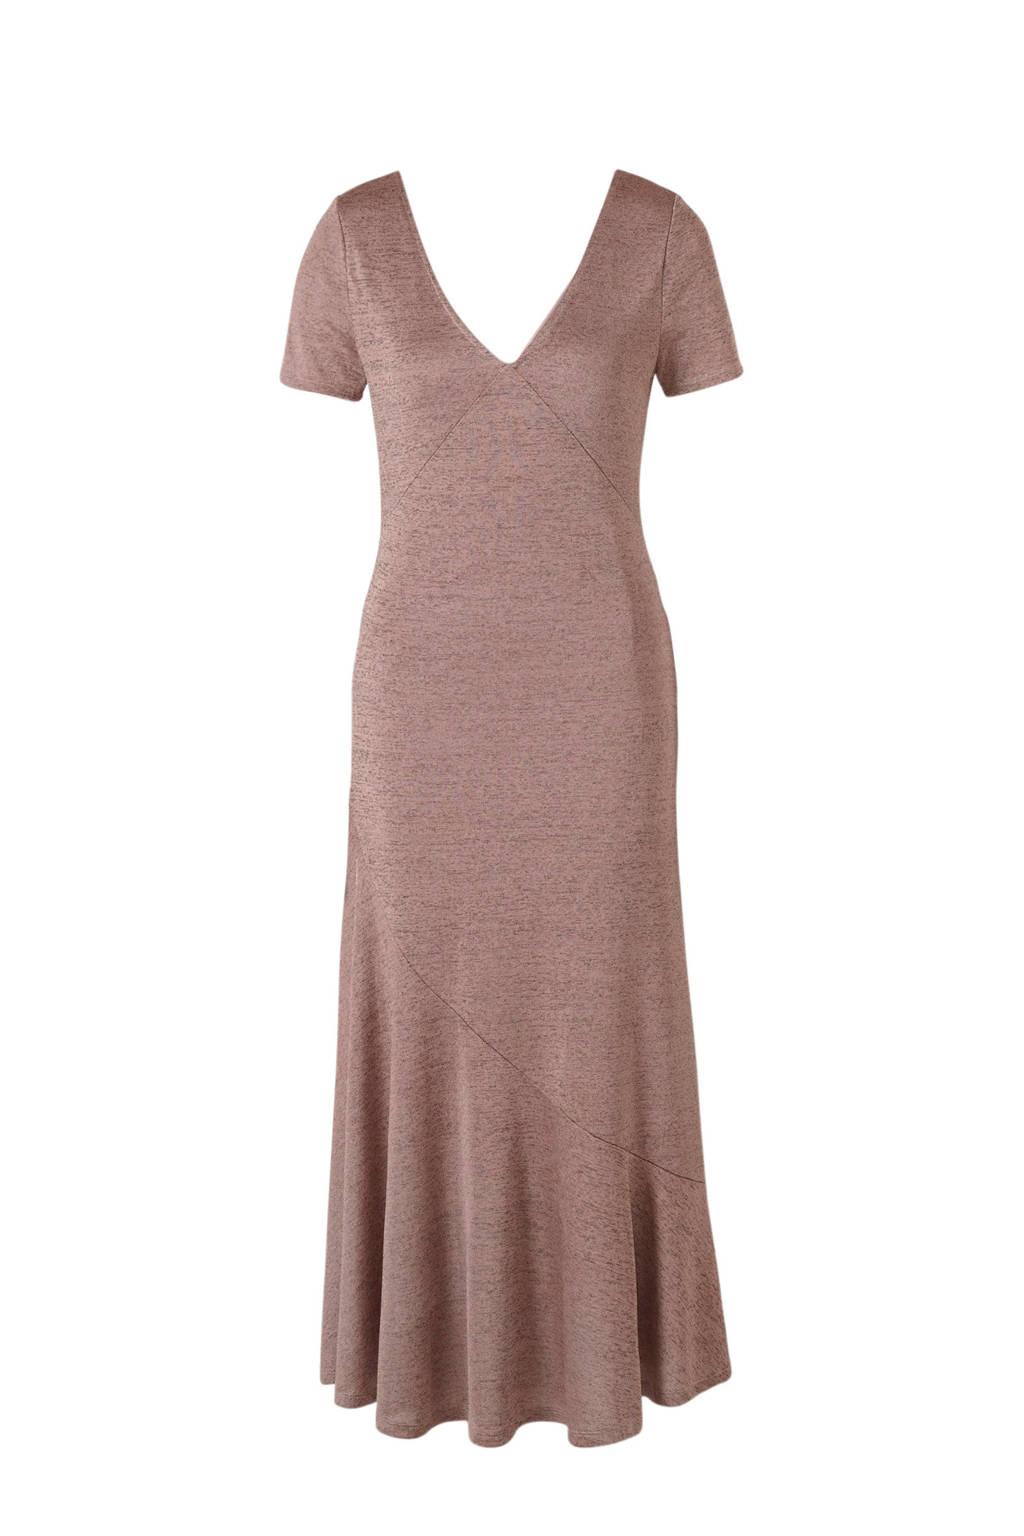 Mango jersey jurk oudroze, Oudroze